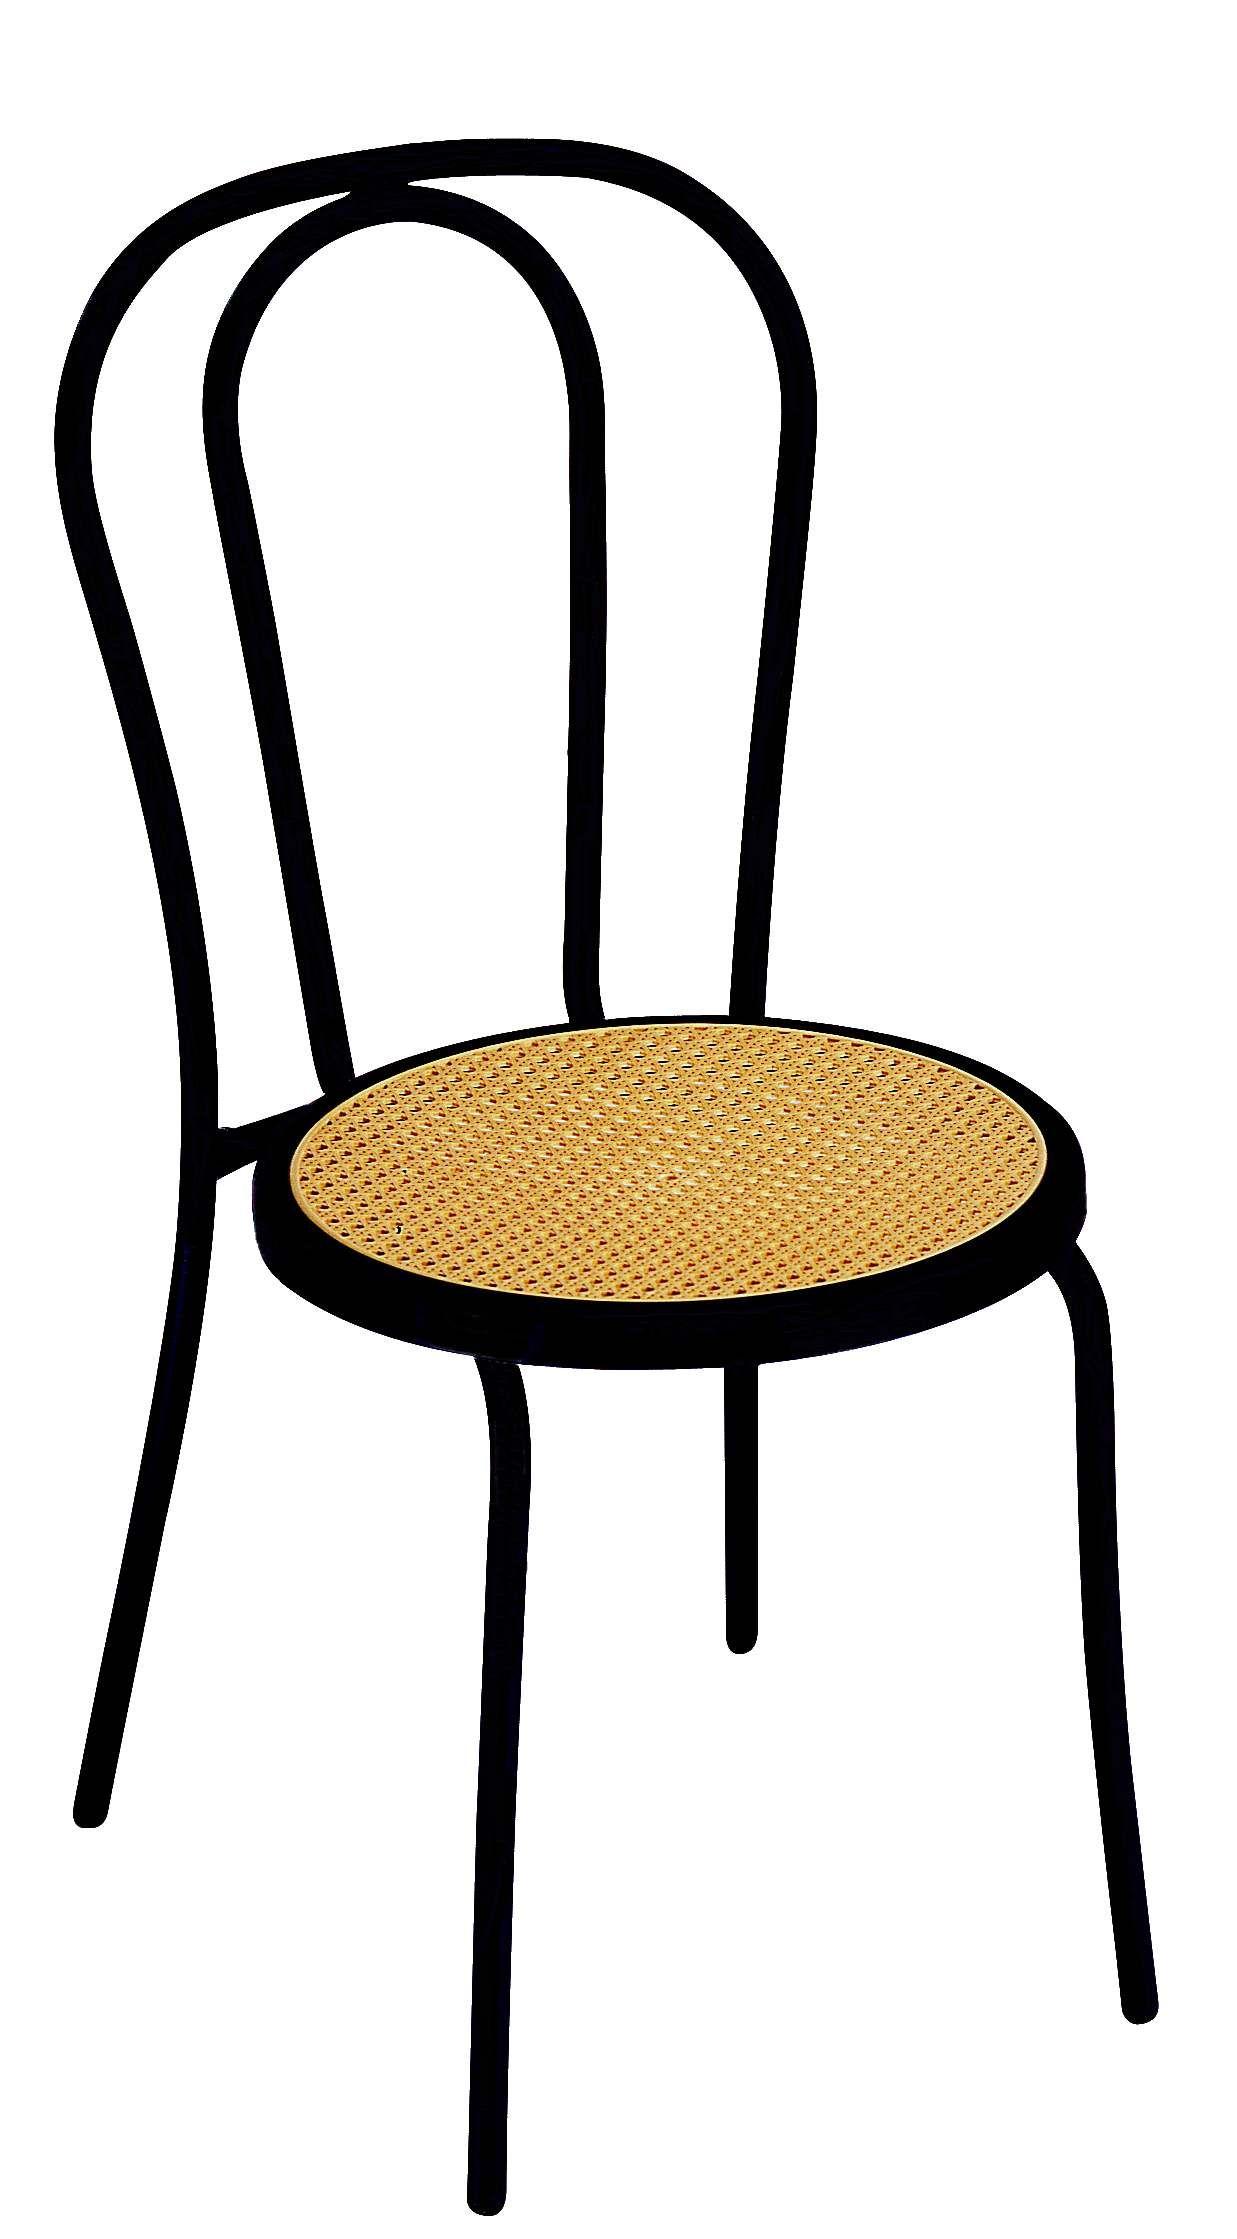 Chaise Bistro Retro Paille Noir Chaise Chair Chaiseempilable Terrasse Mobilierjardin Outdoorindoor Bistro Chaise Terrasse Chaises Bois Mobilier Jardin